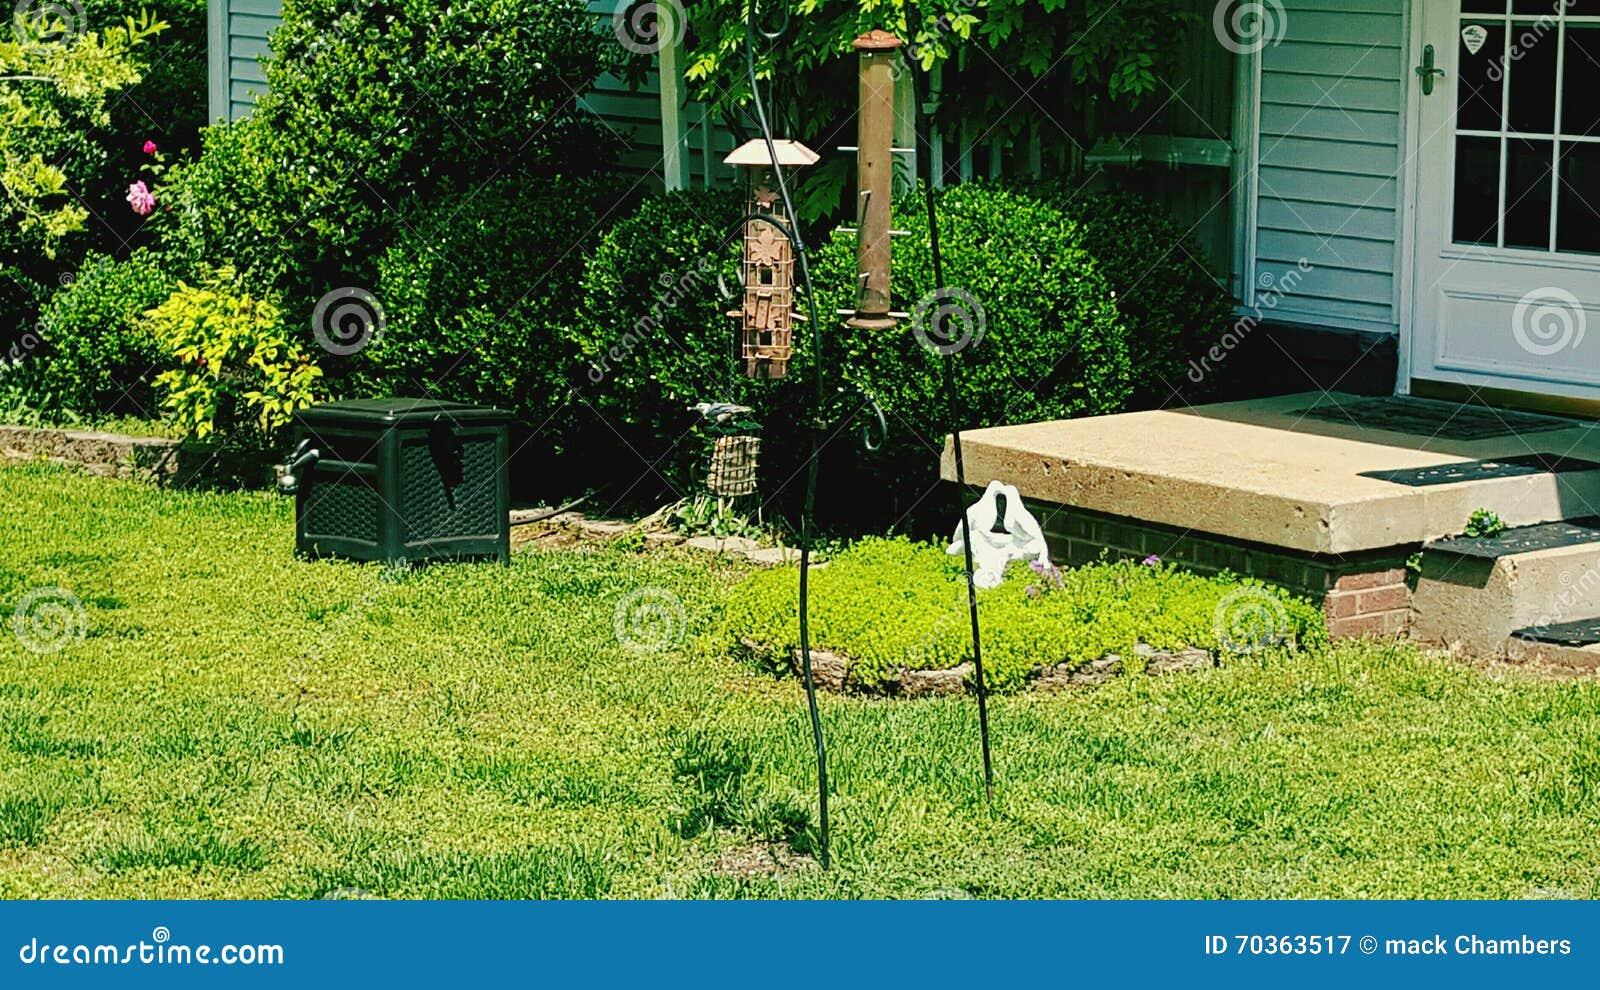 bird on bird feeder in front yard stock photo image 70363517